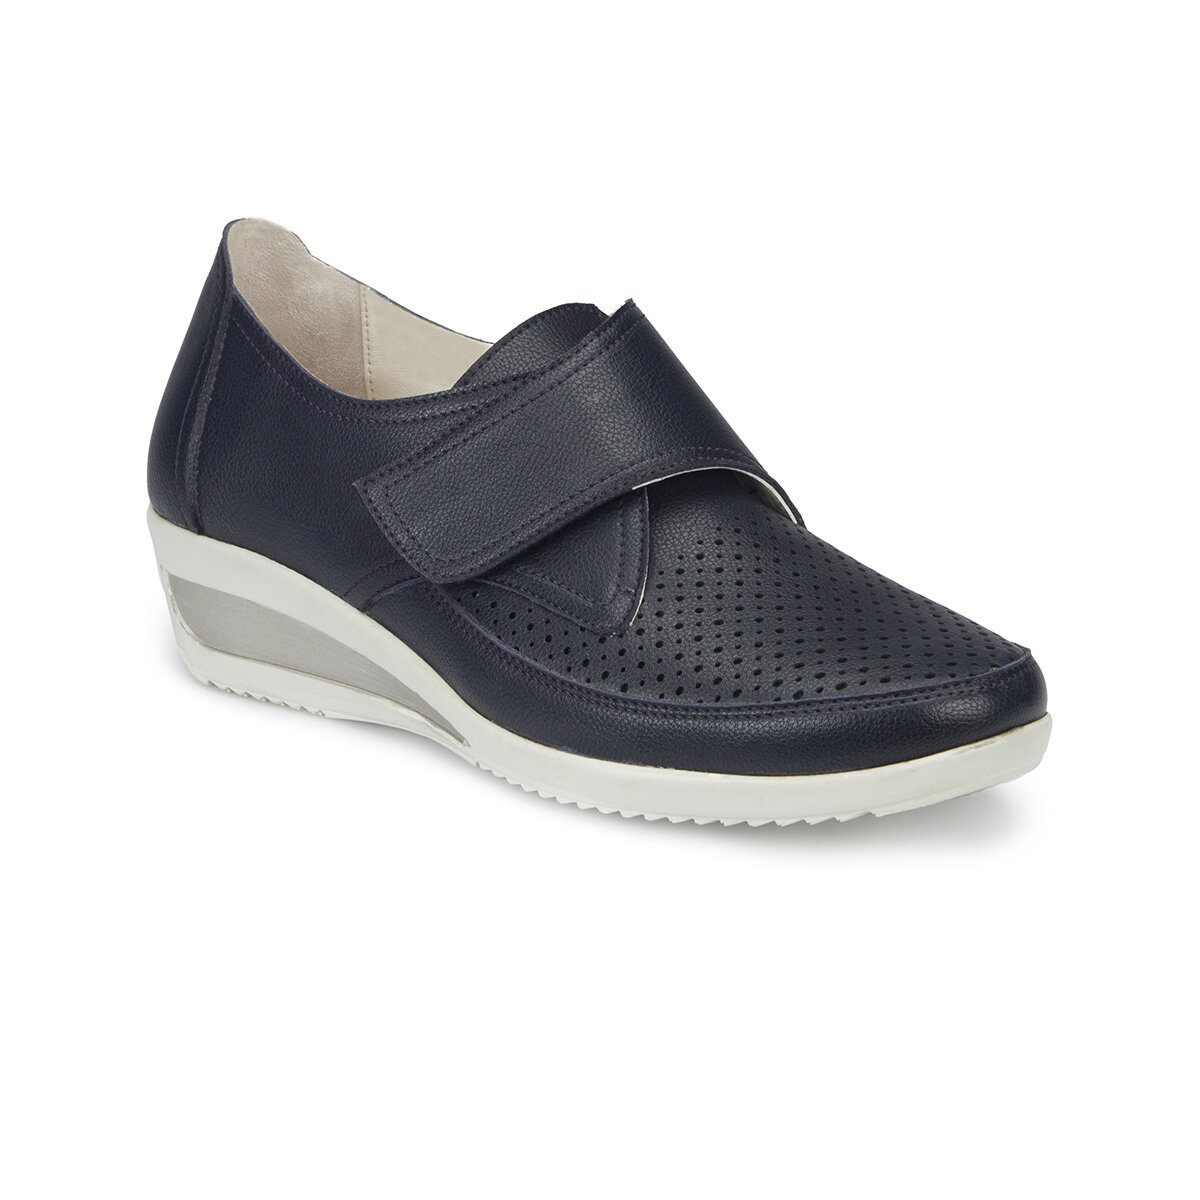 FLO 81.111012.Z Navy Blue Women Basic Comfort Polaris 5 Point